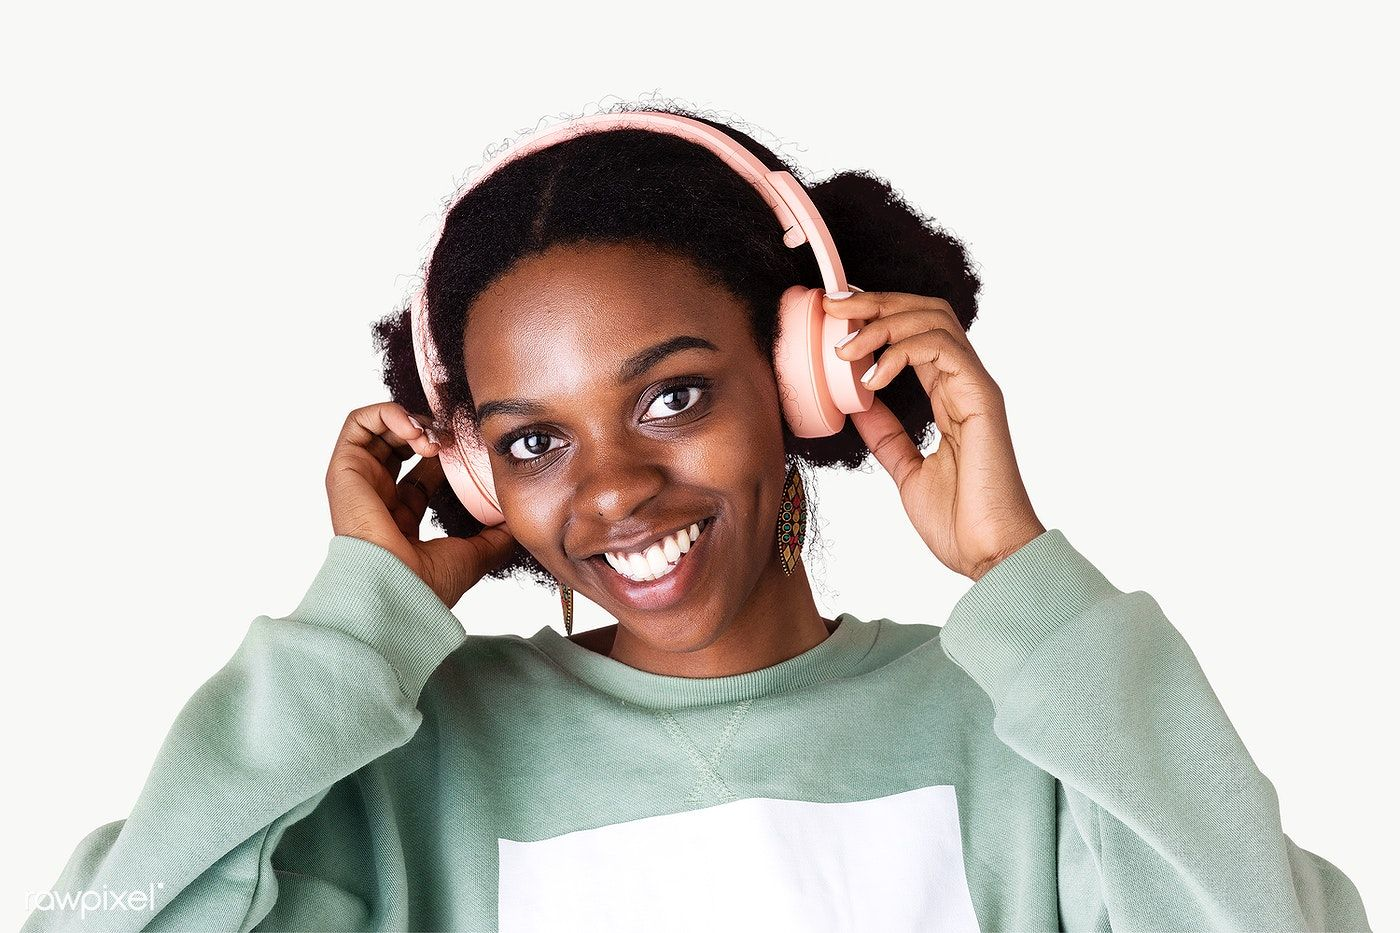 Beautiful Black Woman In A Satin Top Mockup Premium Image By Rawpixel Com Mckinsey Beautiful Black Women Black Women Satin Top